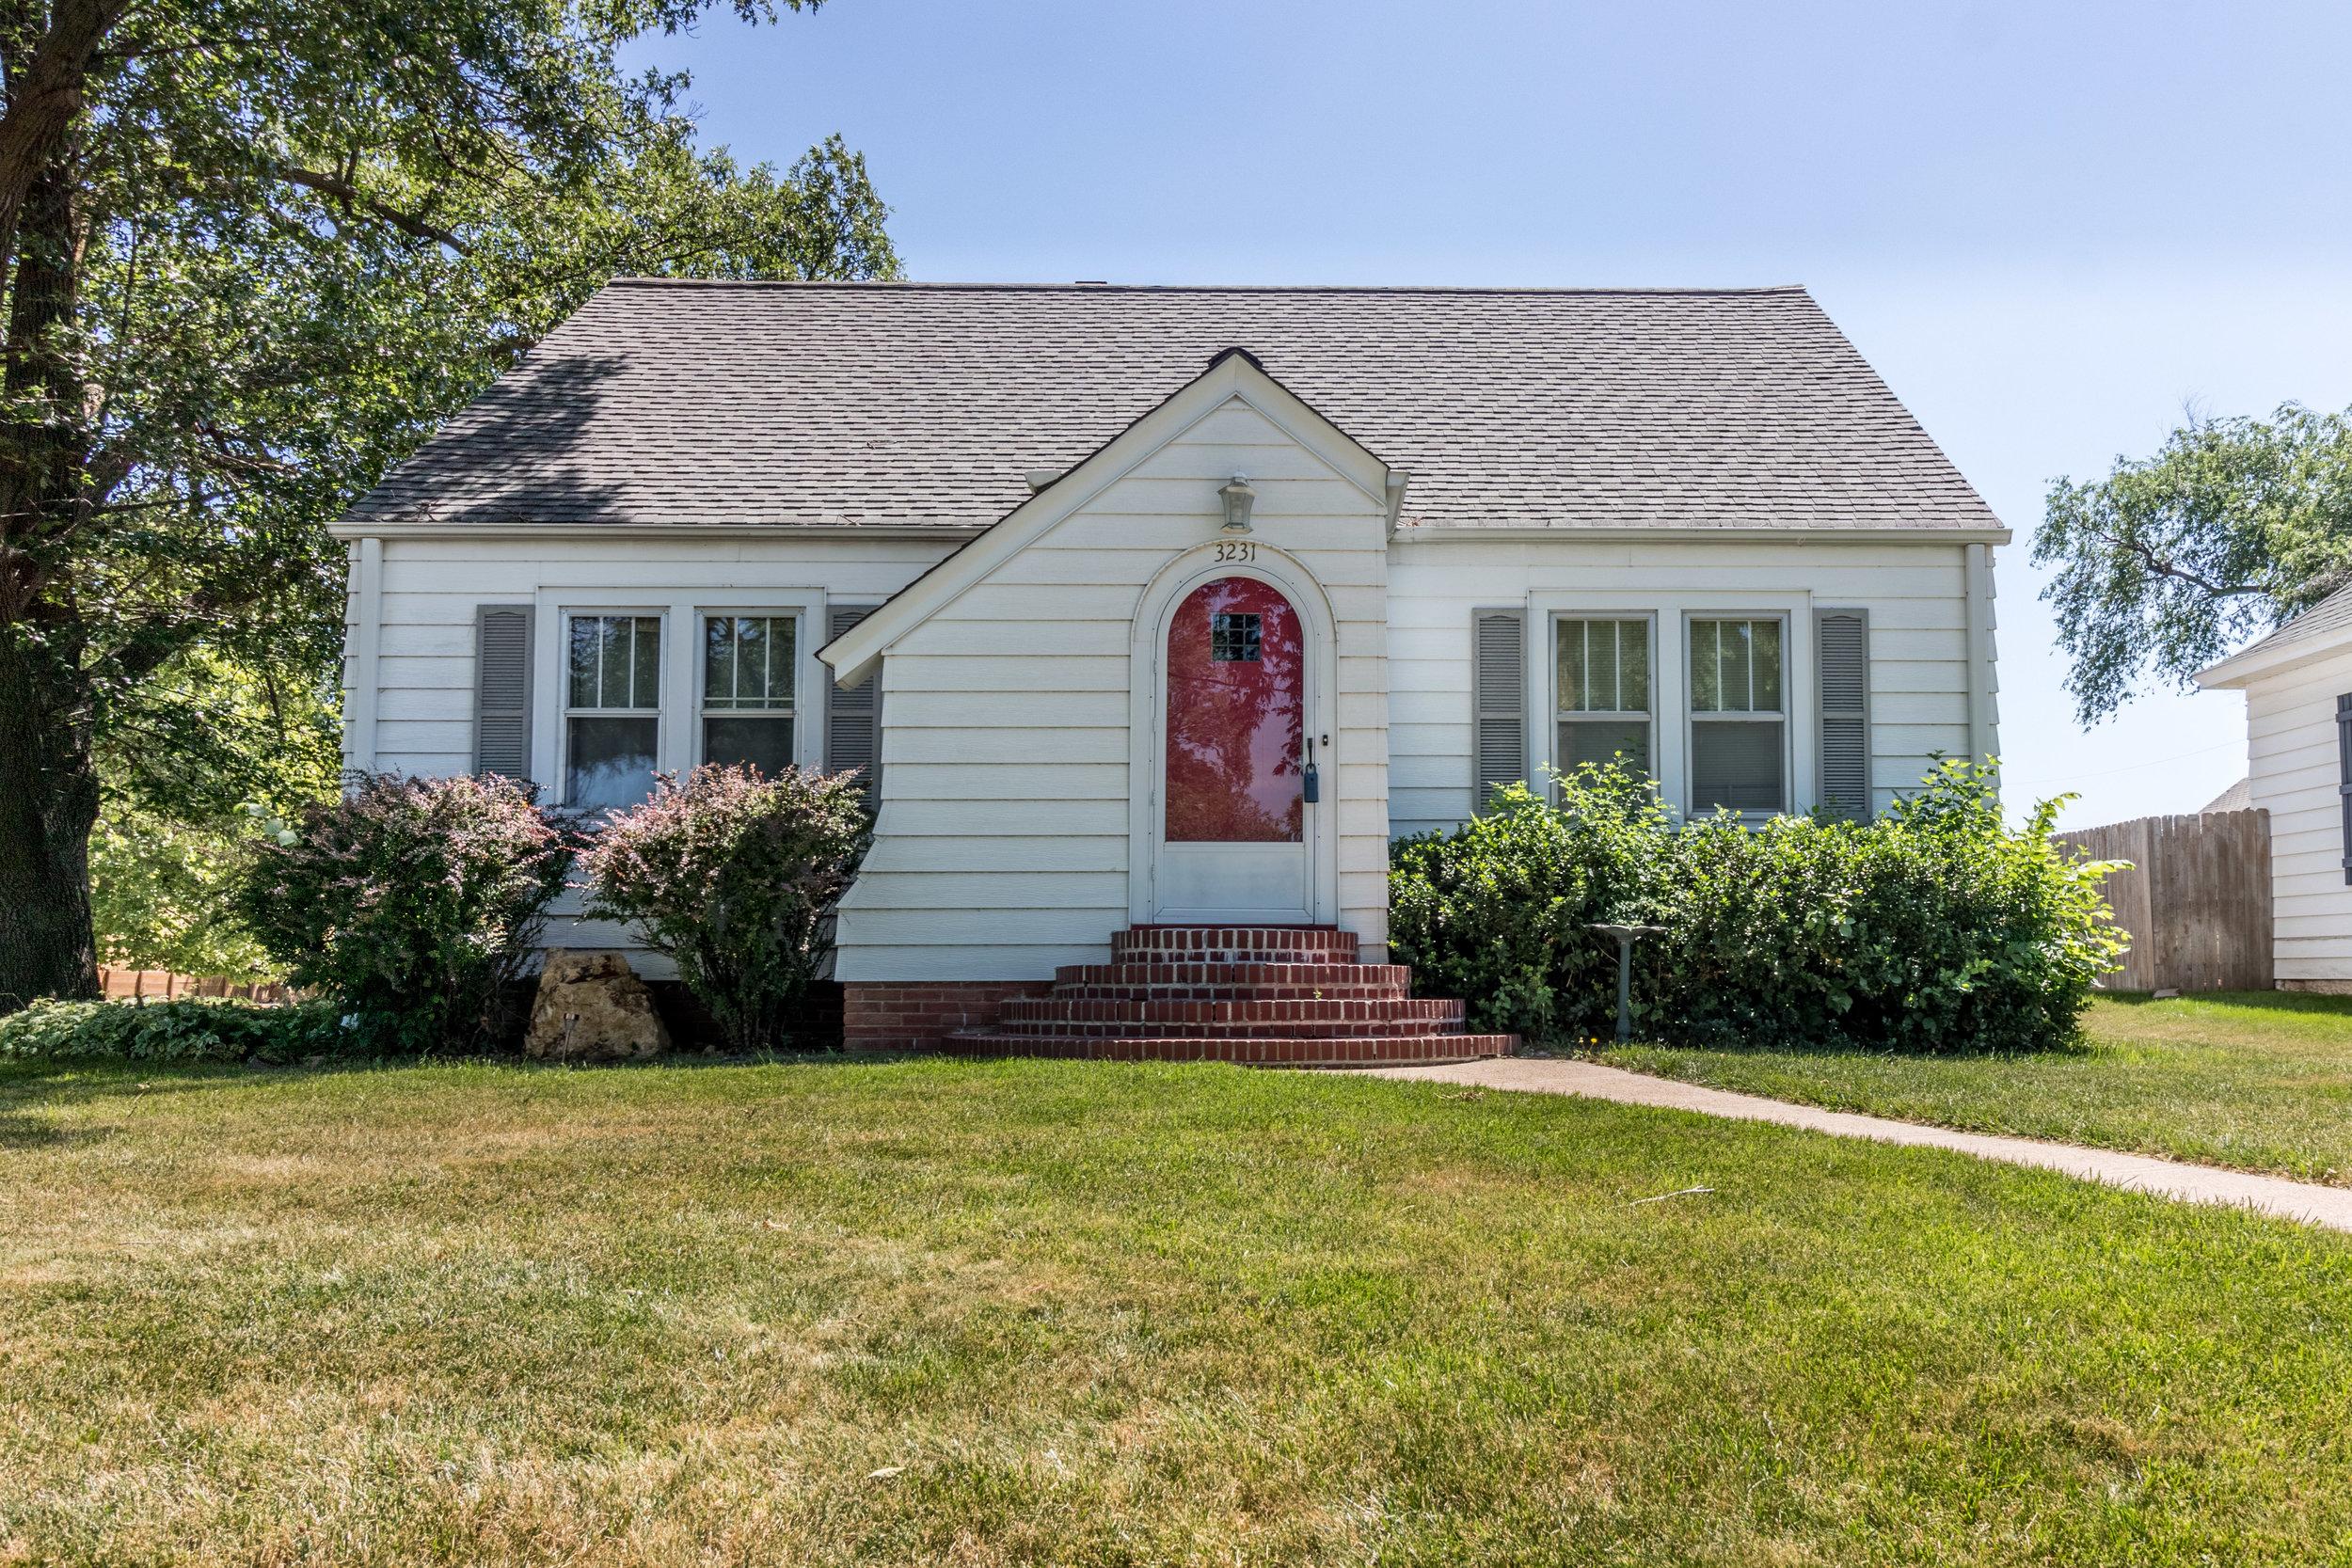 Elkhorn Gem - 3231 N 205th Street | Elkhorn | $195,000